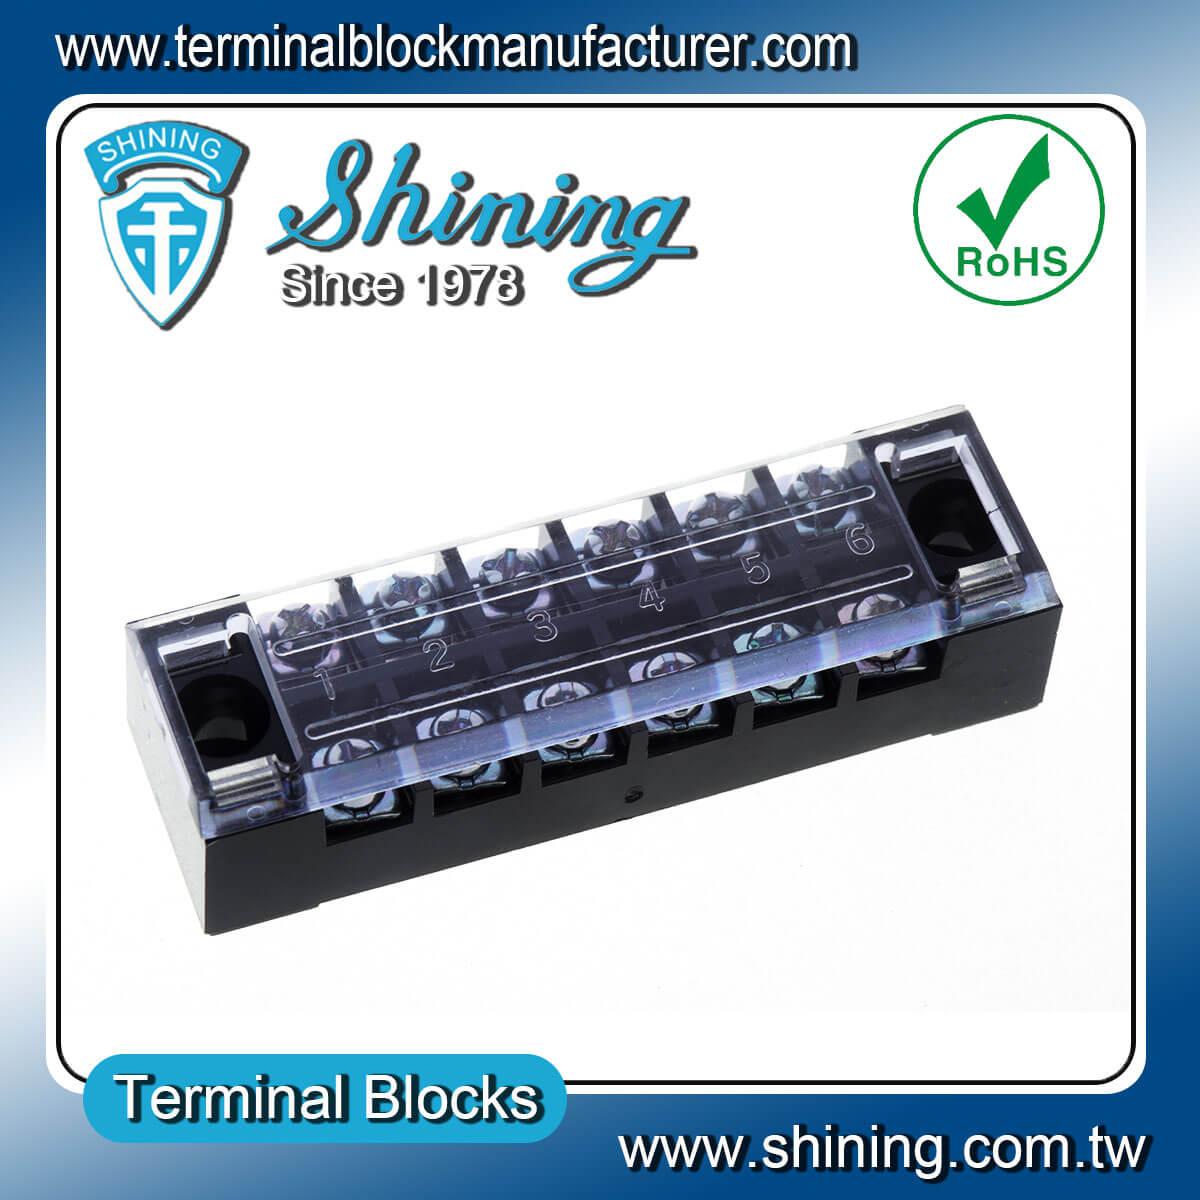 TB-2506 600V 25A 6Pole固定式柵欄端子台